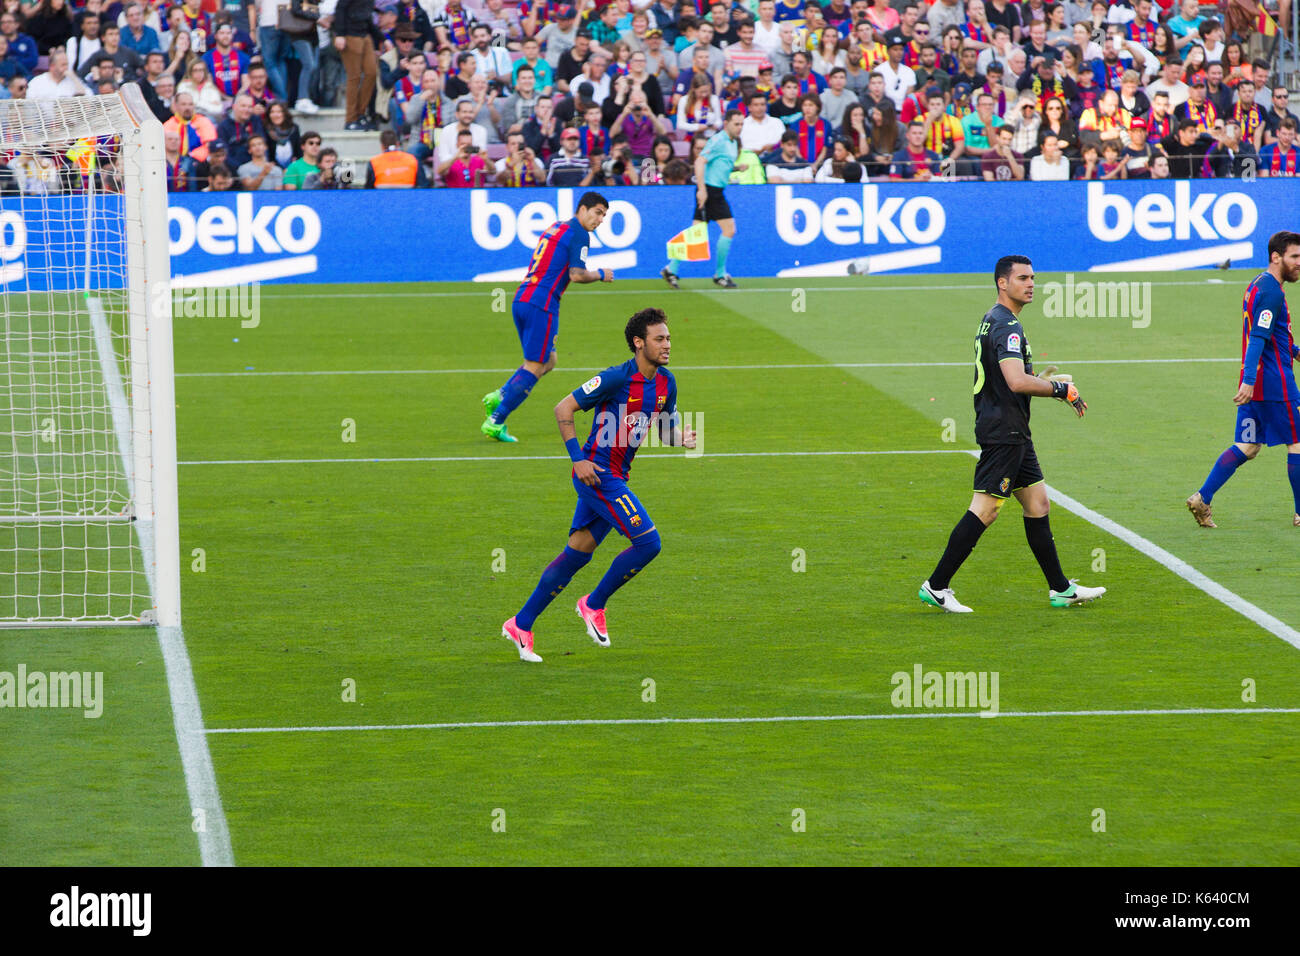 Neymar Jr - 6/5/17 Barcelona v Villarreal football league match at the Camp Nou stadium, Barcelona. - Stock Image